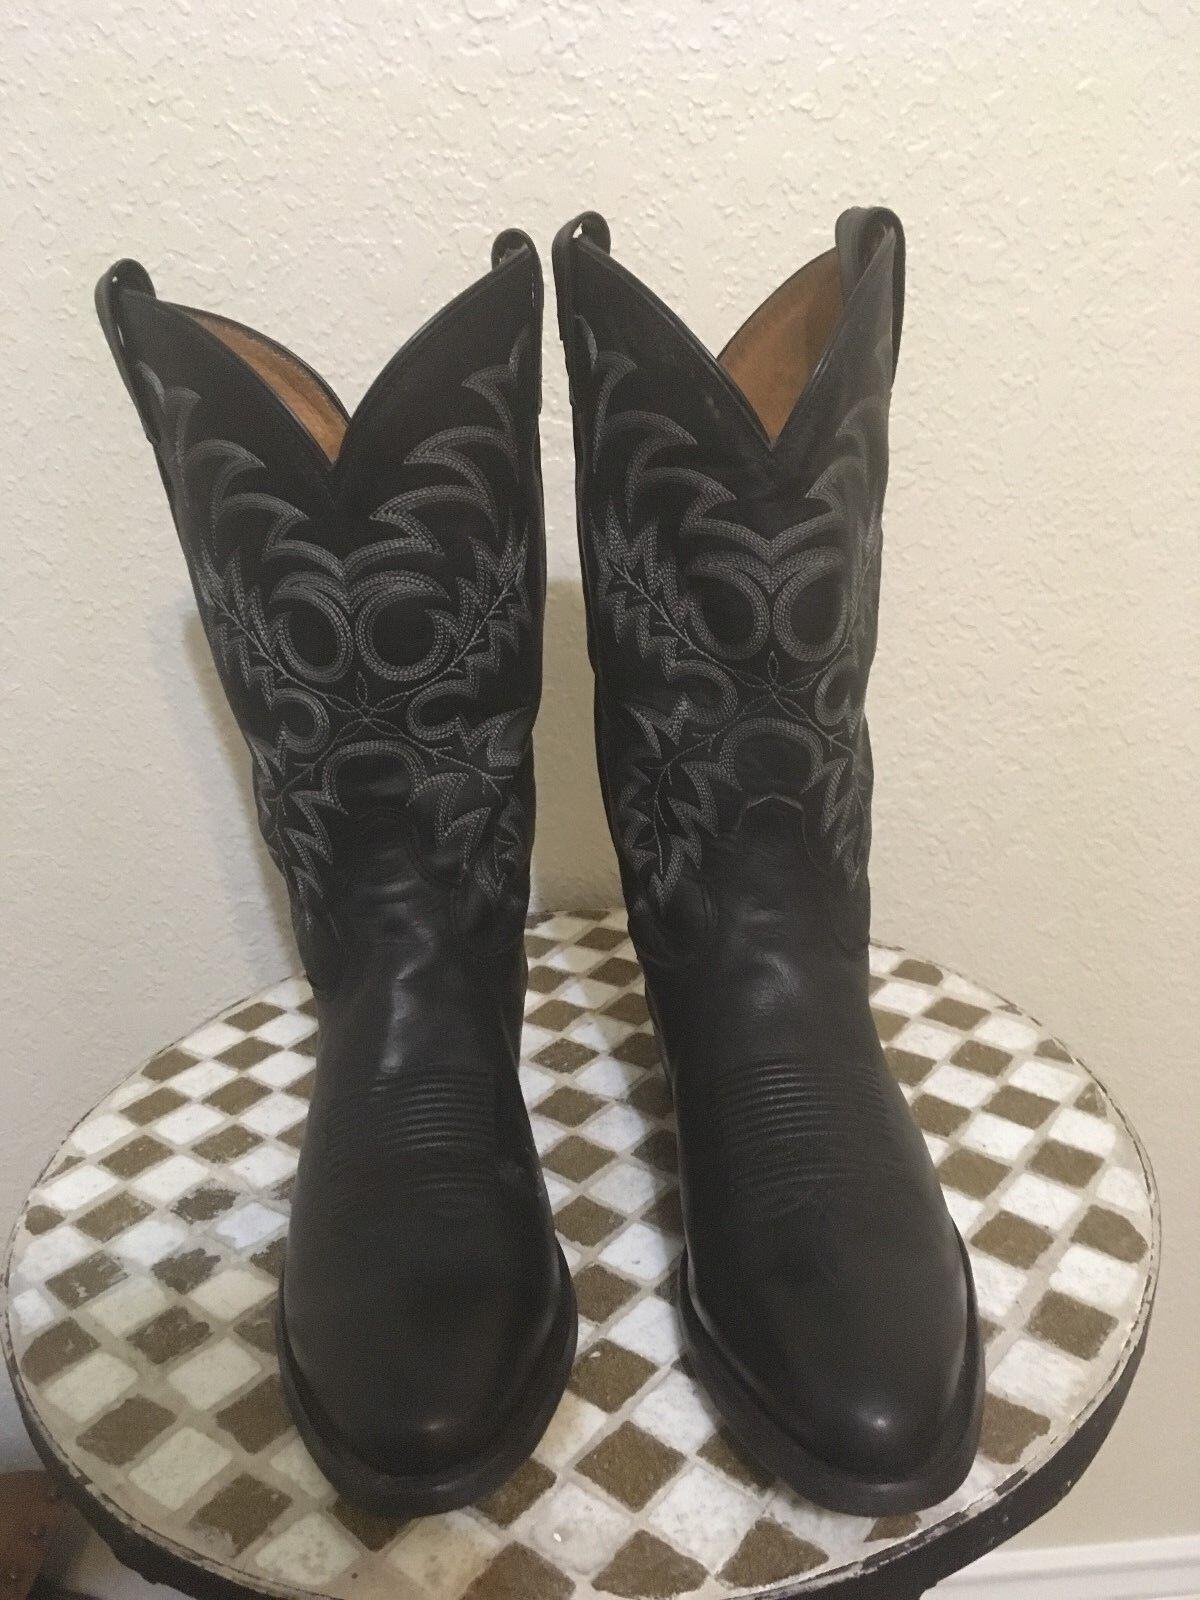 BLACK USA TONY LAMA WESTERN TRAIL BOSS COWBOY BOOTS 10.5 10.5 10.5 D 7679b0